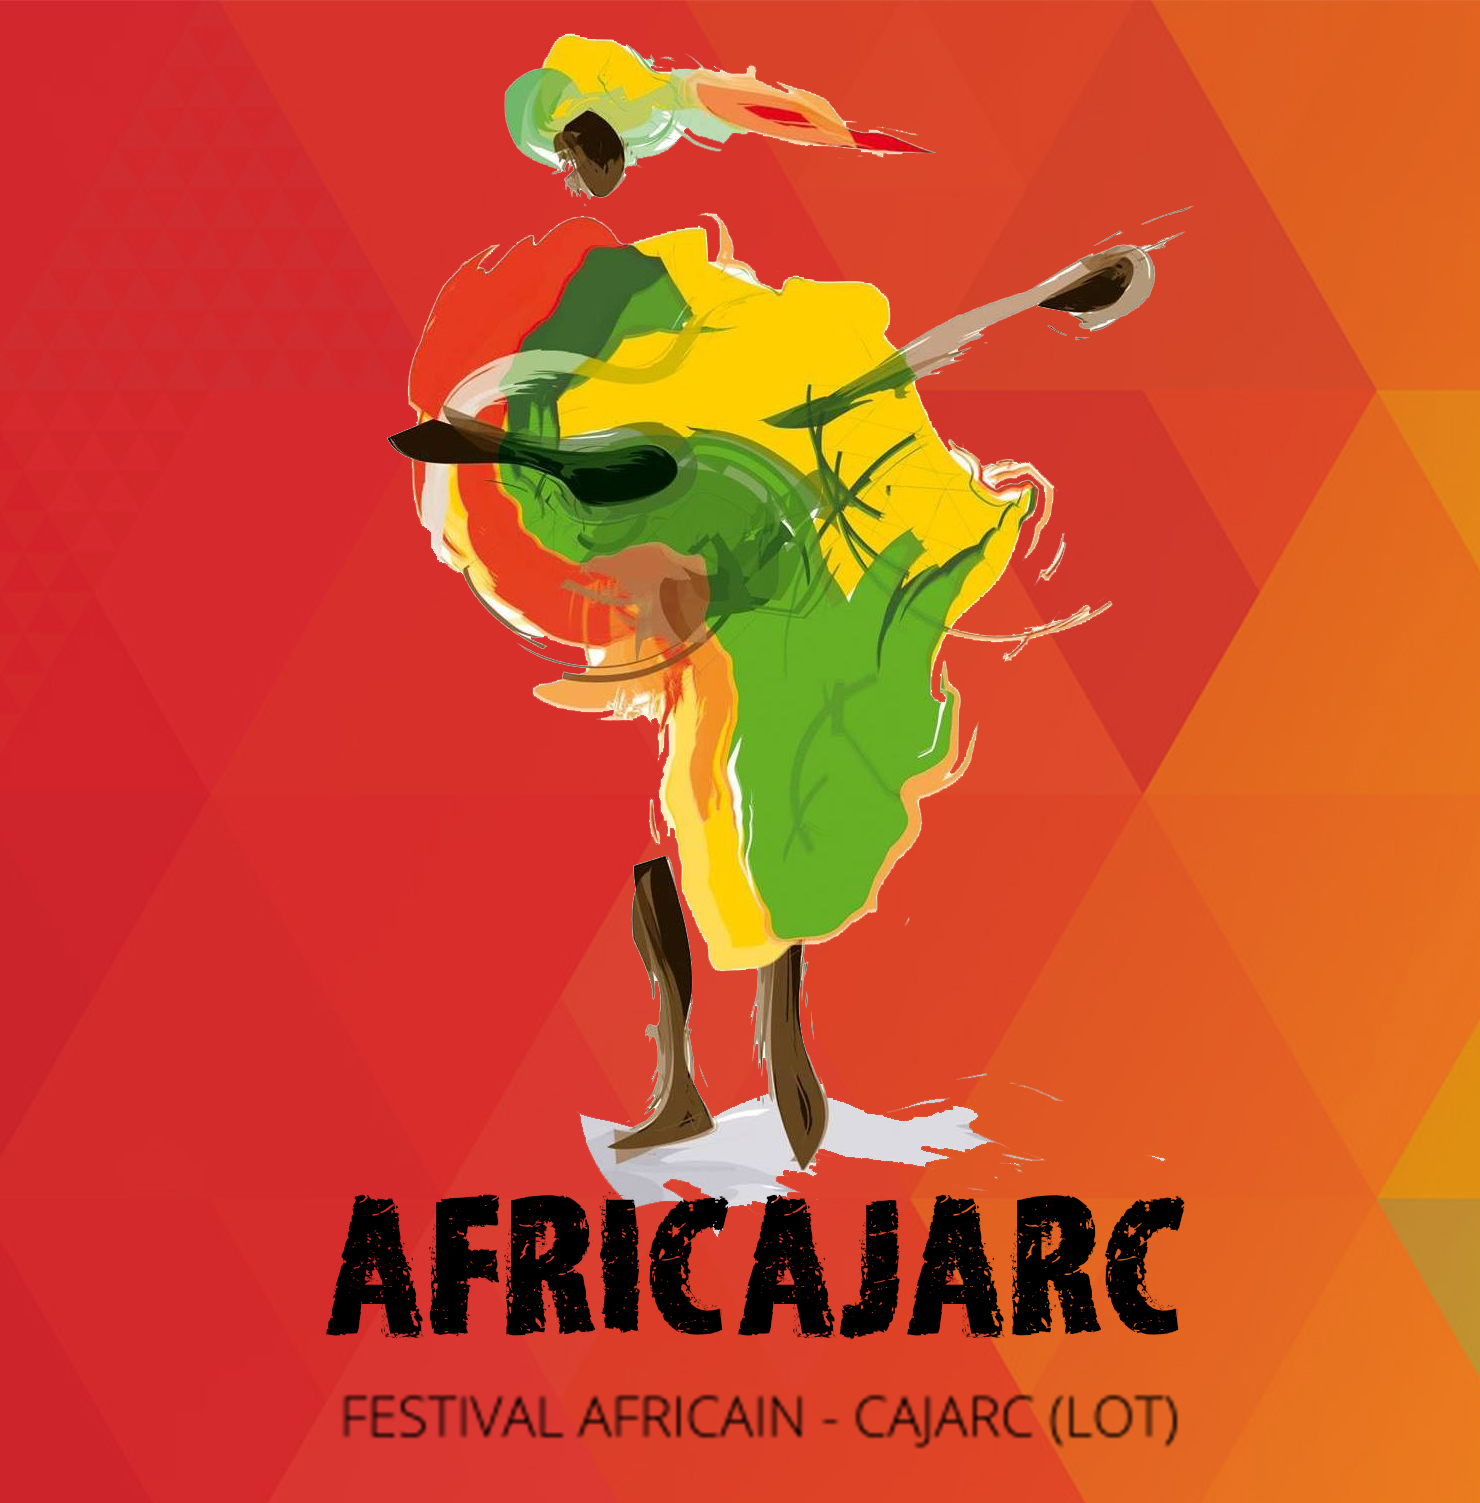 Association - Africajarc